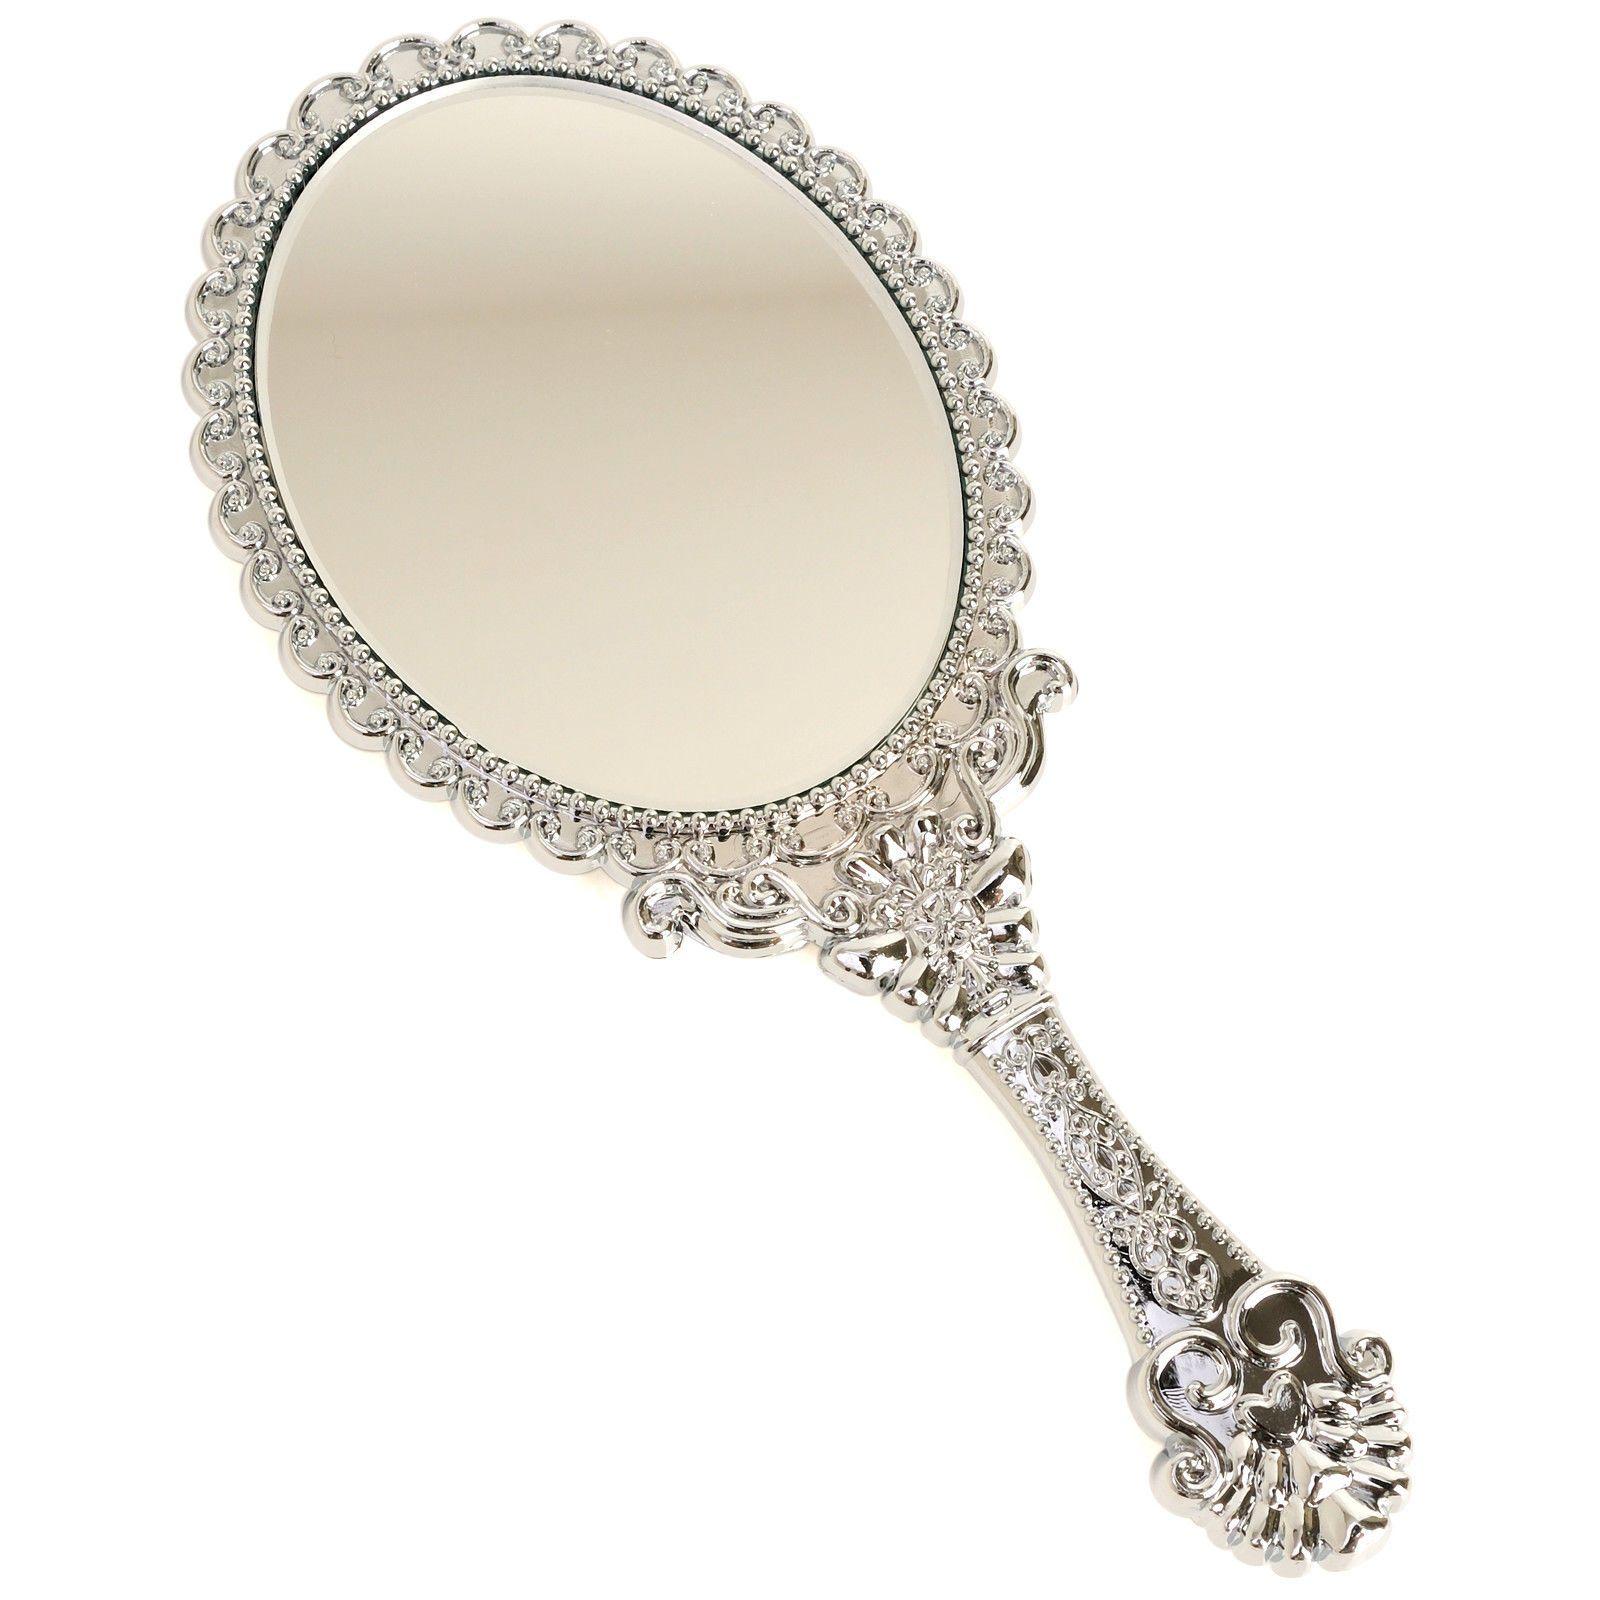 Antique English Hand Held Vanity Mirror Victorian Late 19th Century Handheld Mirror Hand Mirror Vanity Mirror